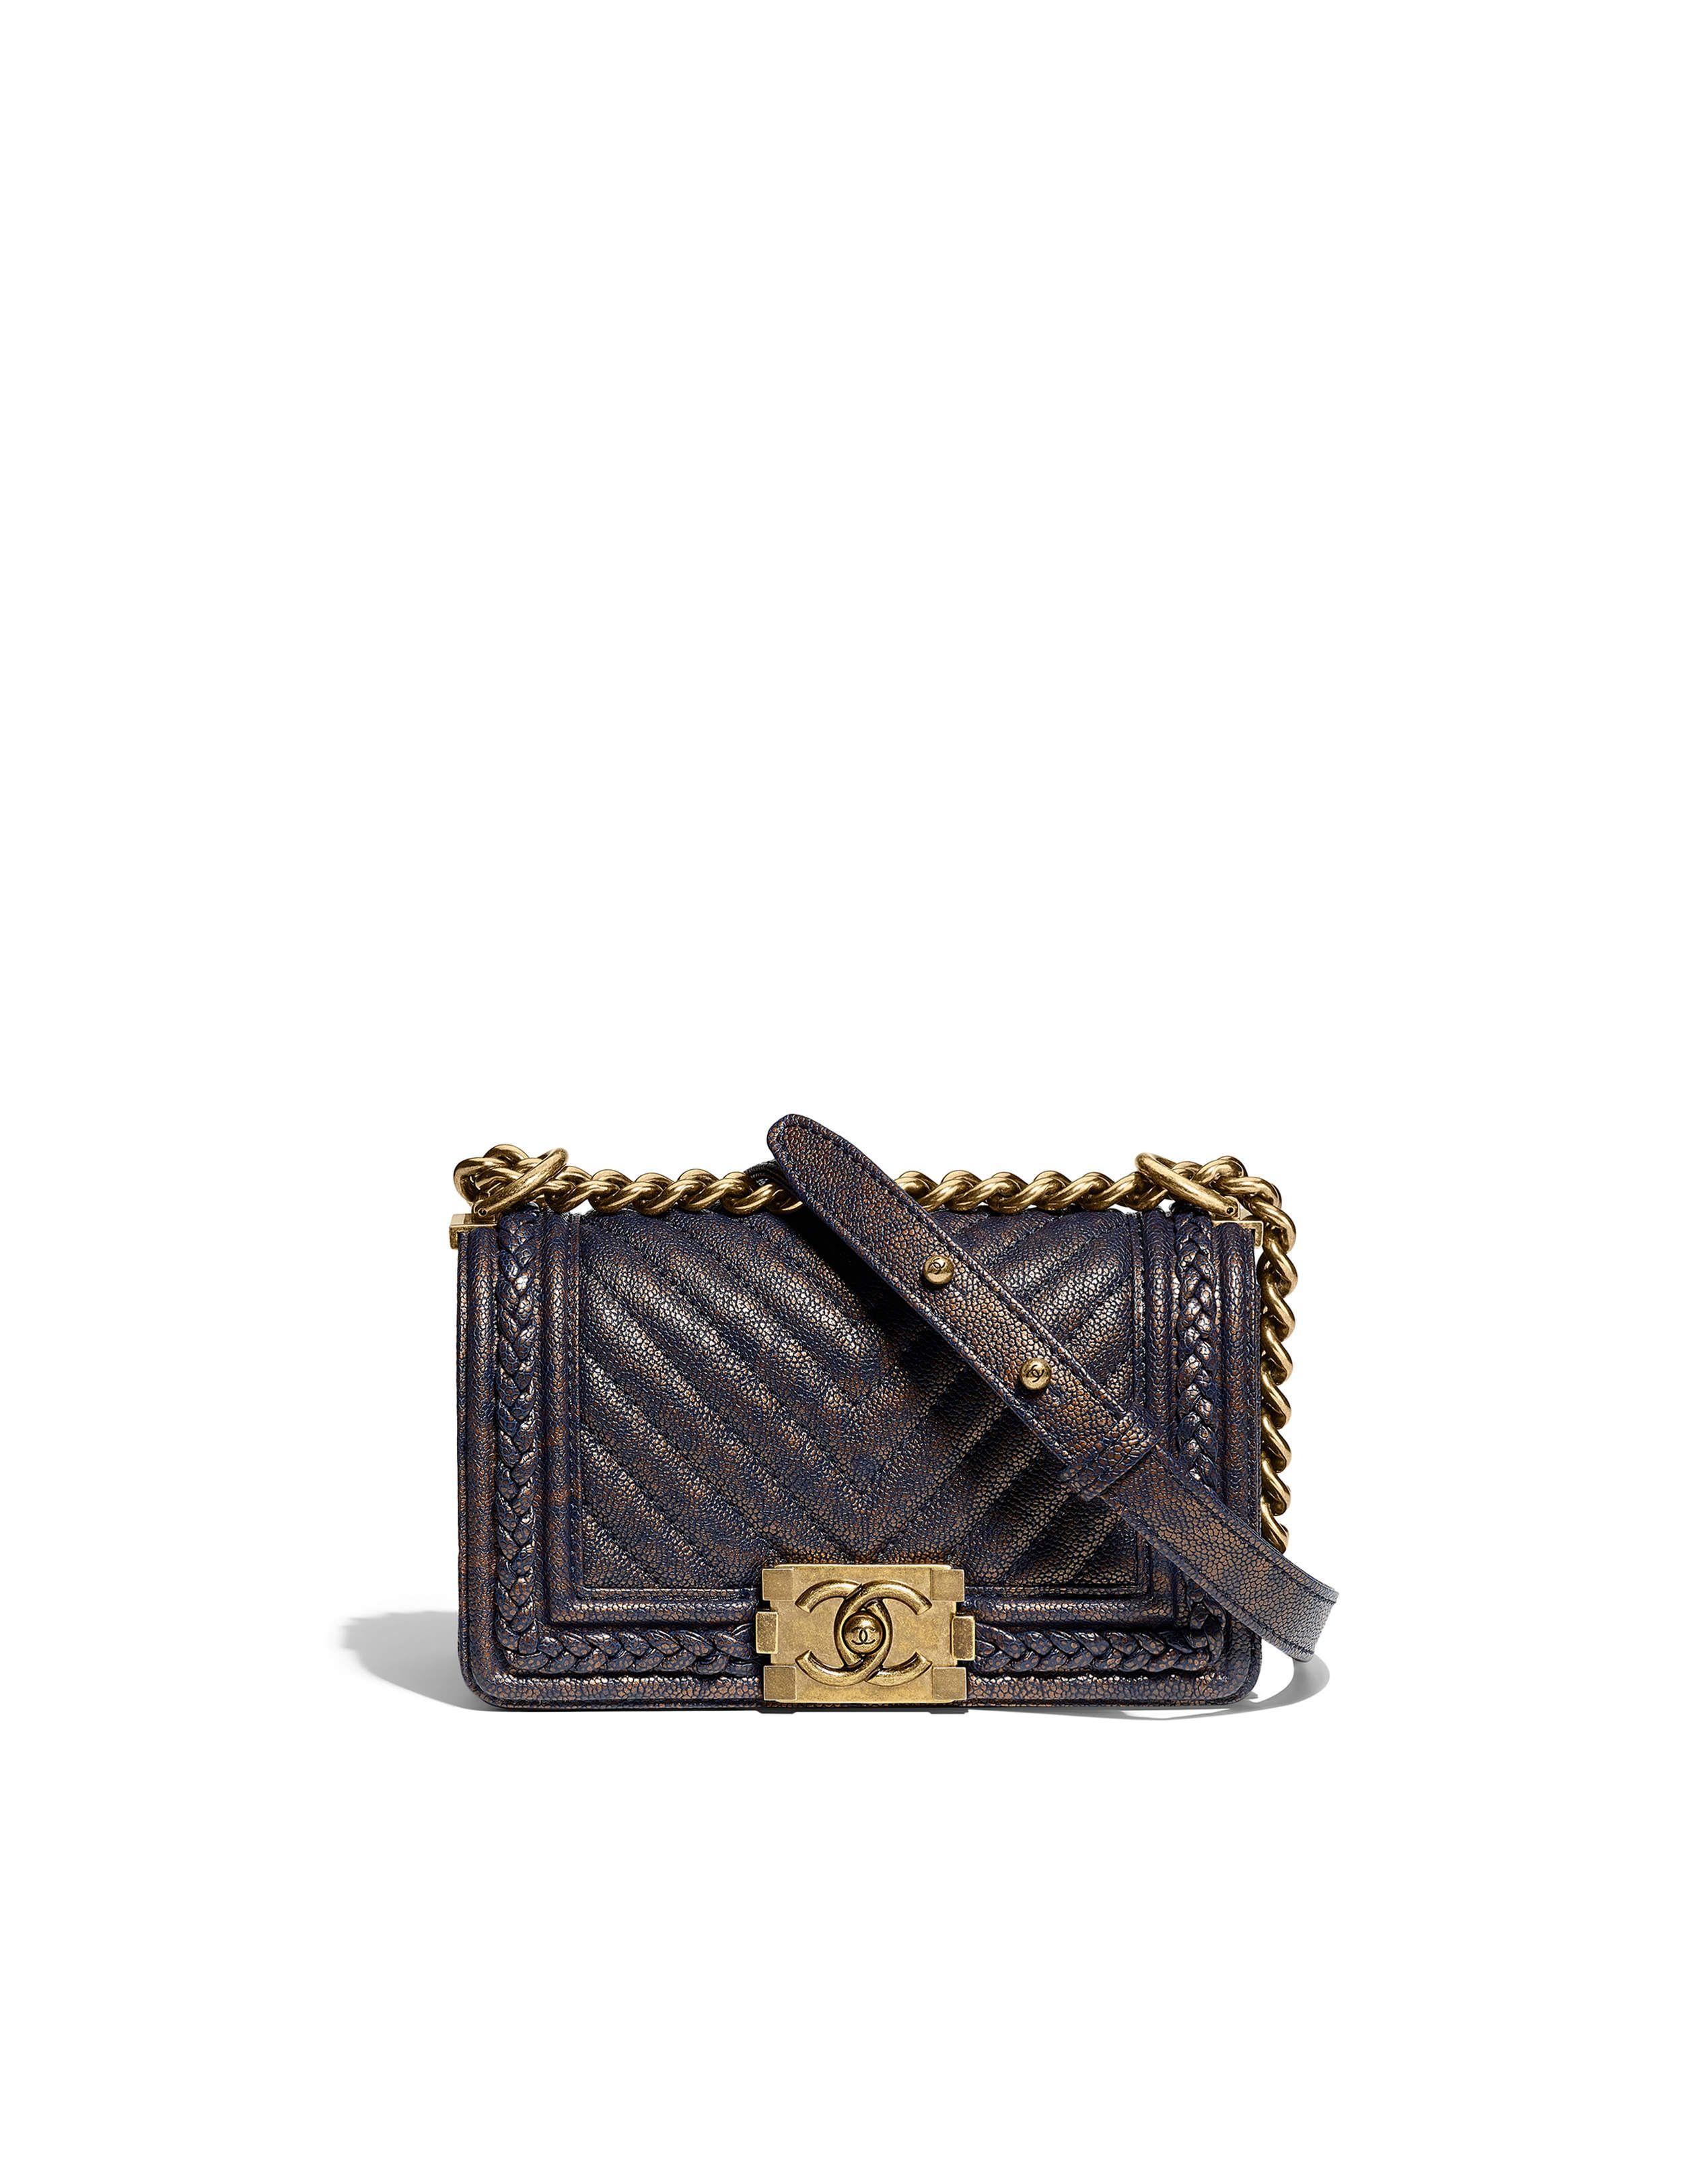 d87f4d0b619bbf $2800 Flap bag, grained calfskin & gold-tone metal-black - CHANEL | Must  Have | Fashion handbags, Chanel fashion, Chanel bags 2017